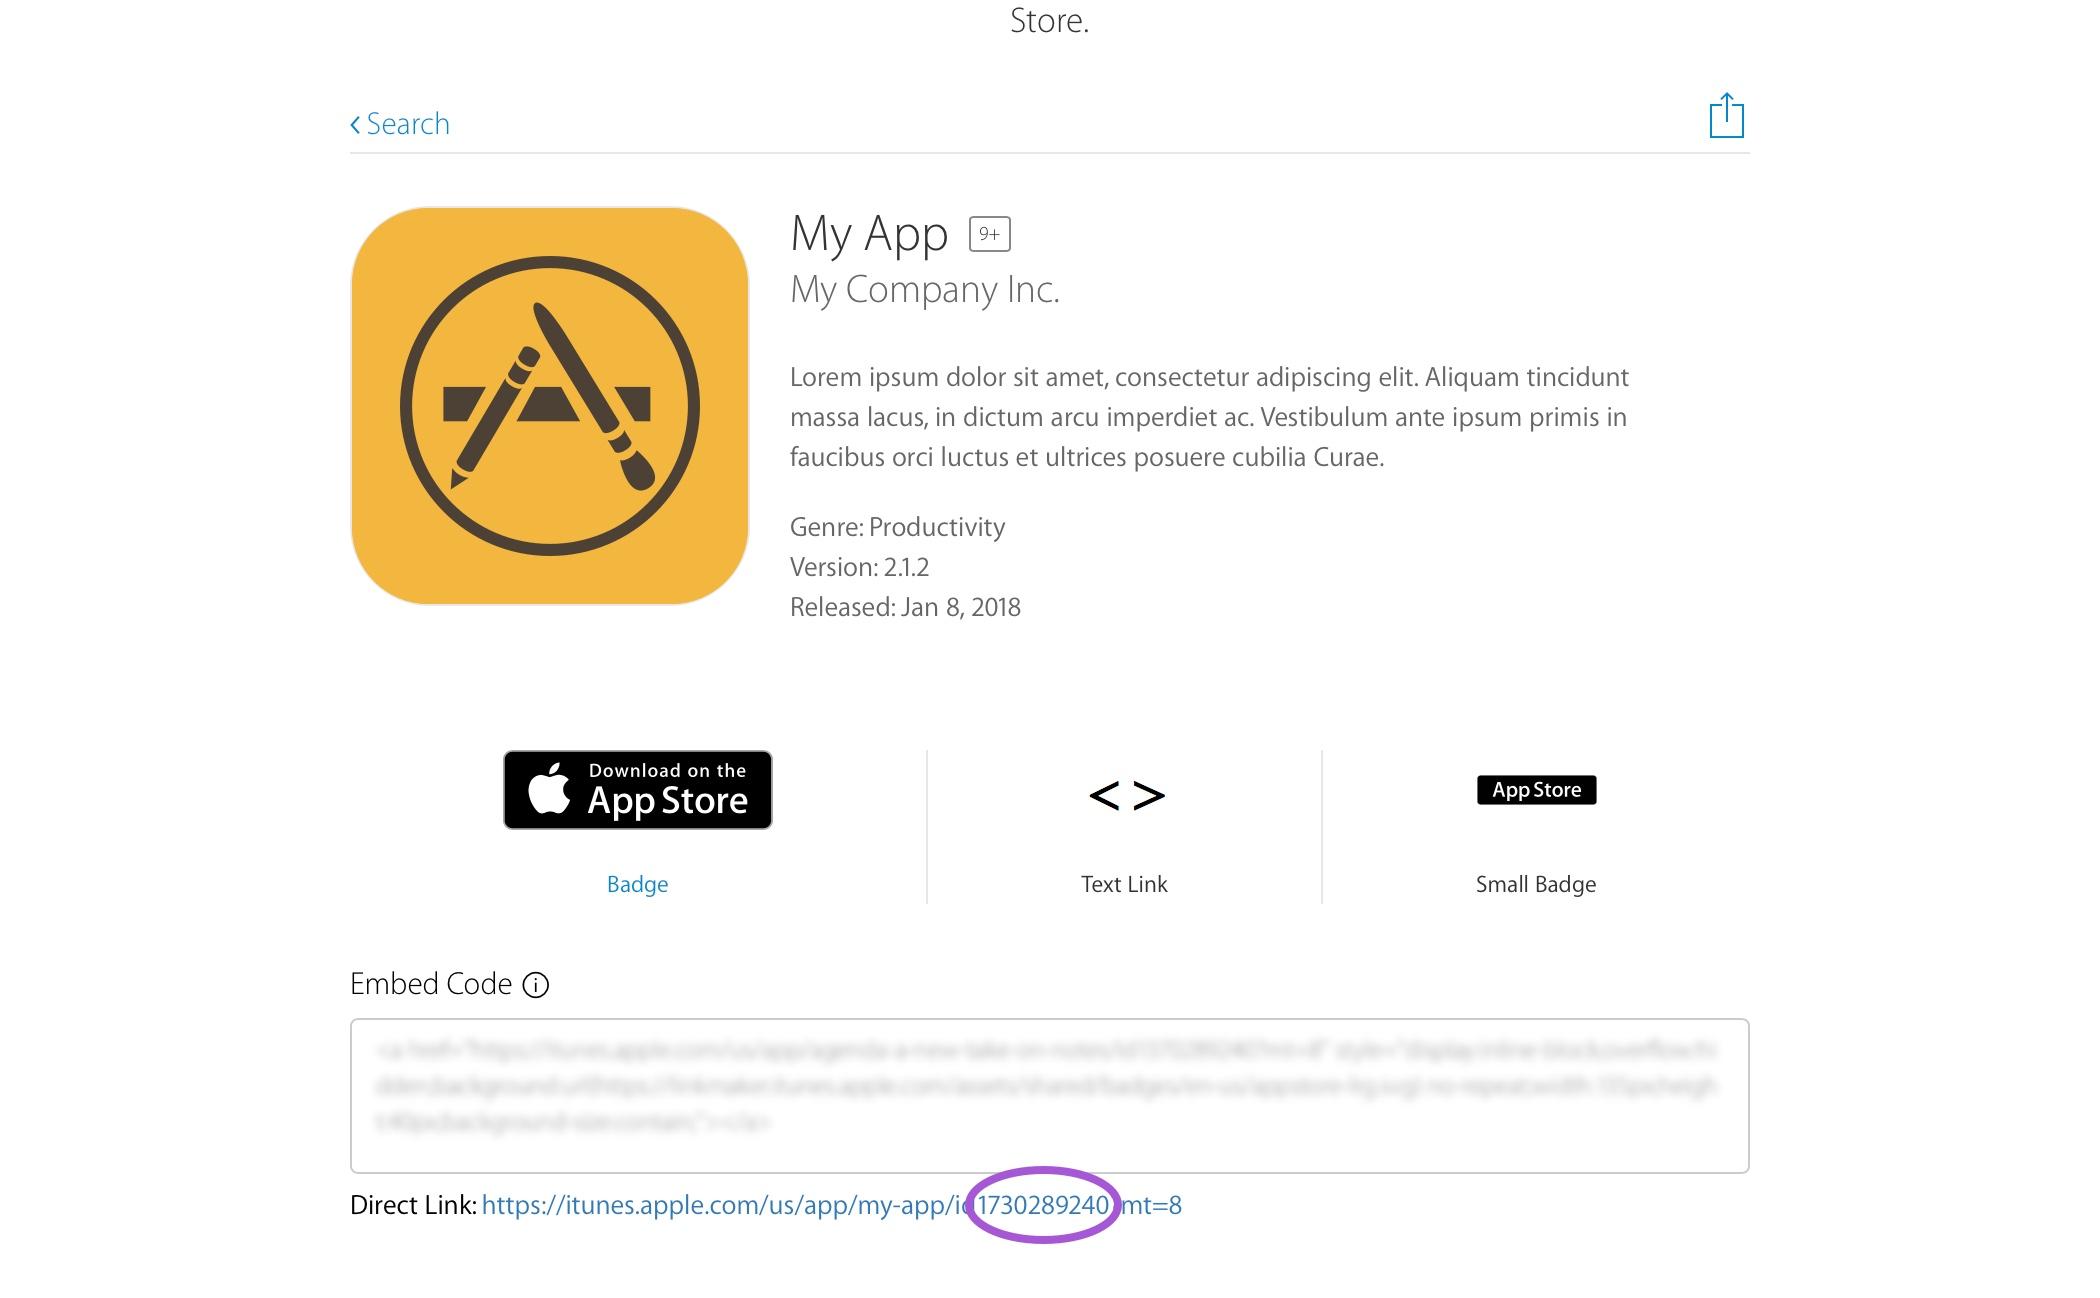 App Store ID